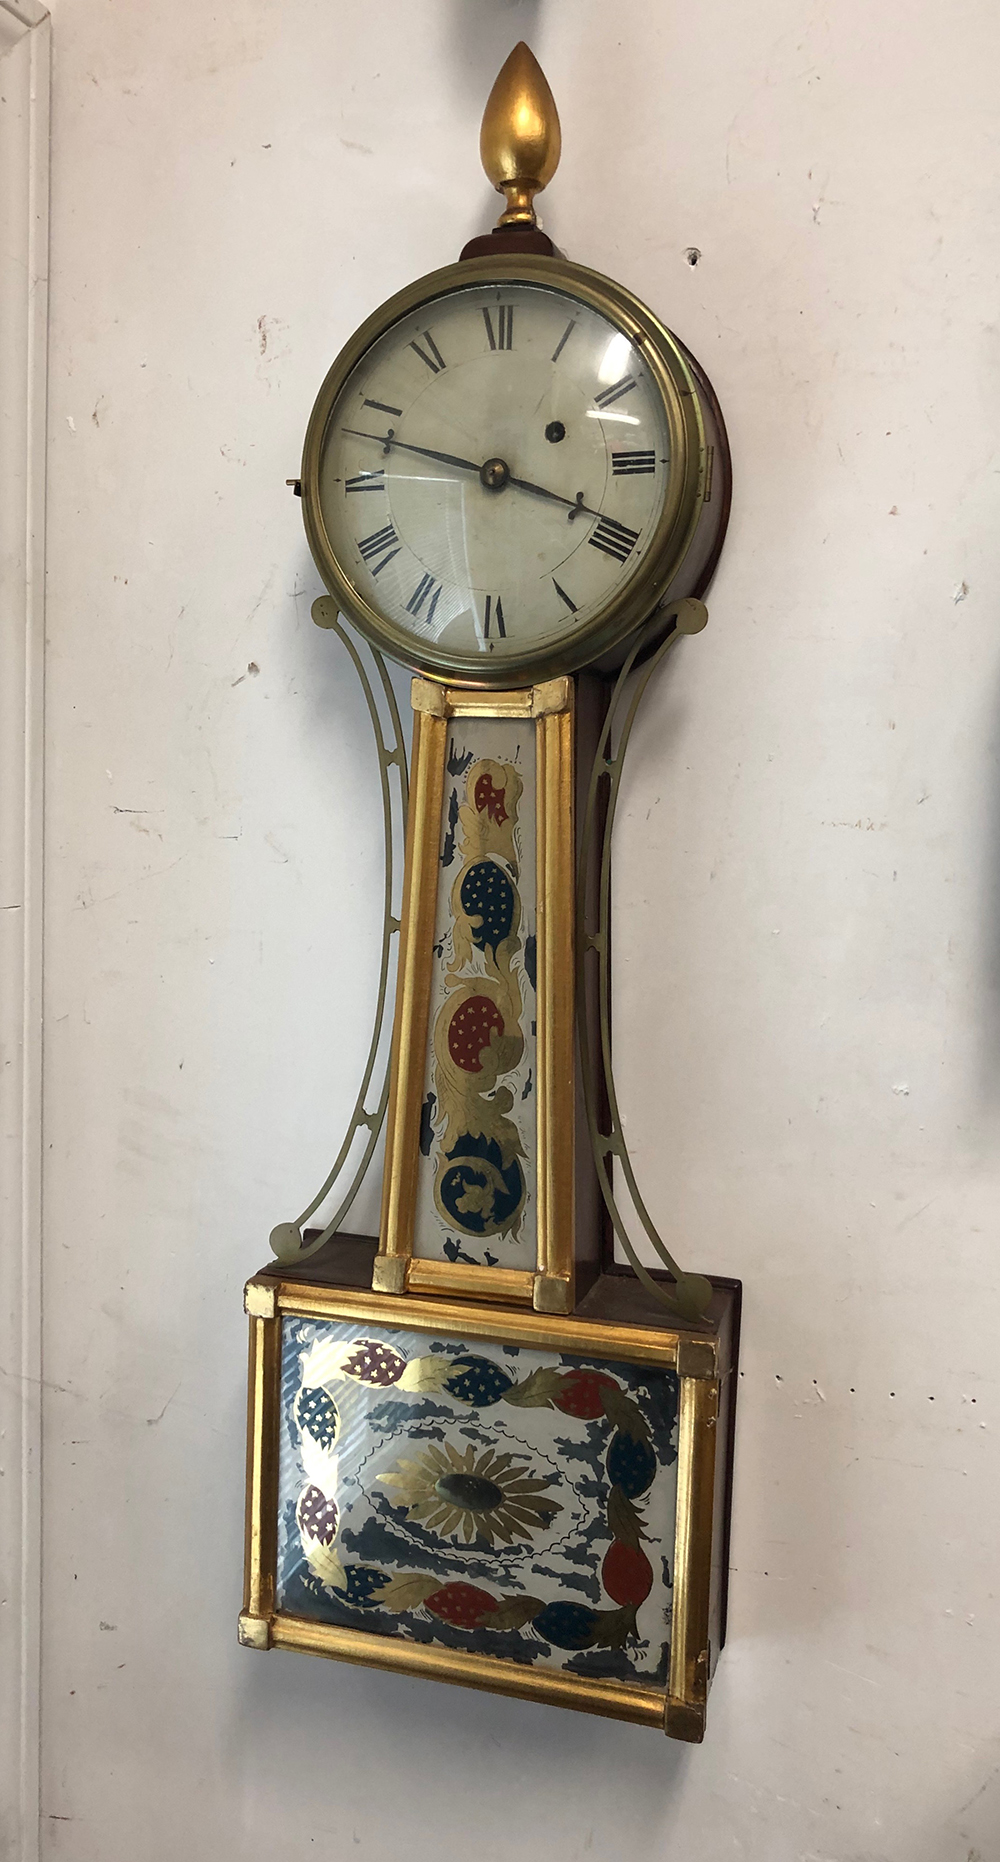 Antique Presentation Banjo Clock